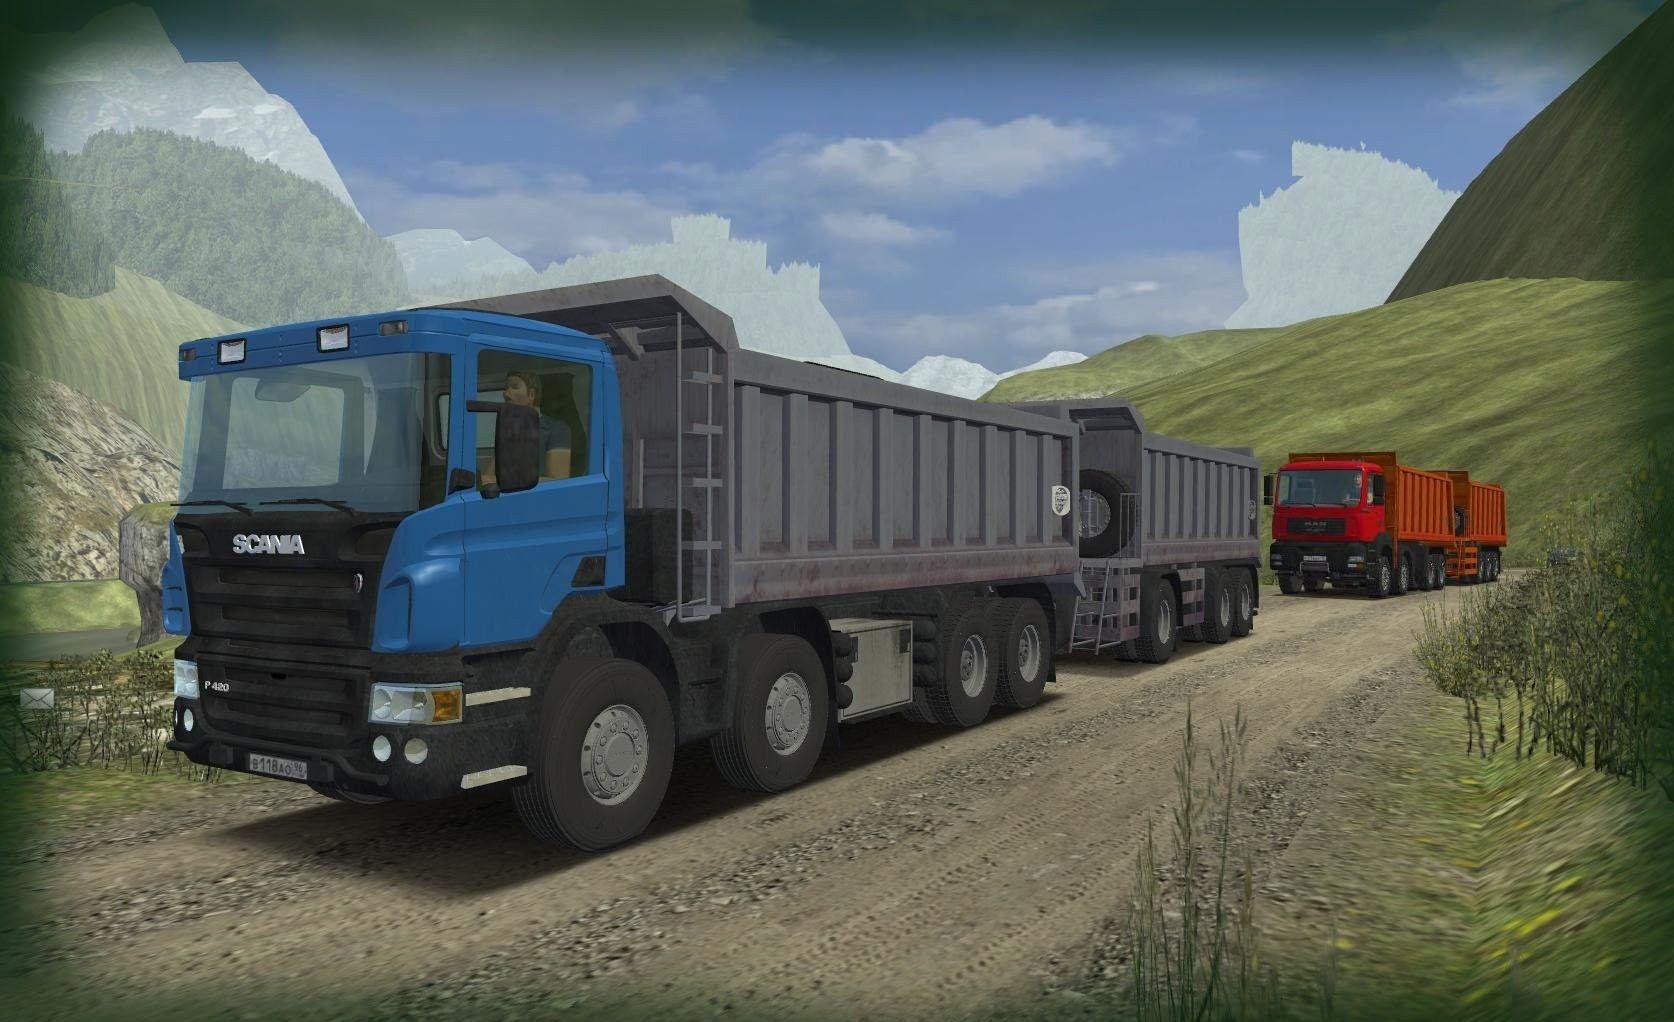 Euro Truck Simulator Free Download for Windows 10, 7, 8/8 ...